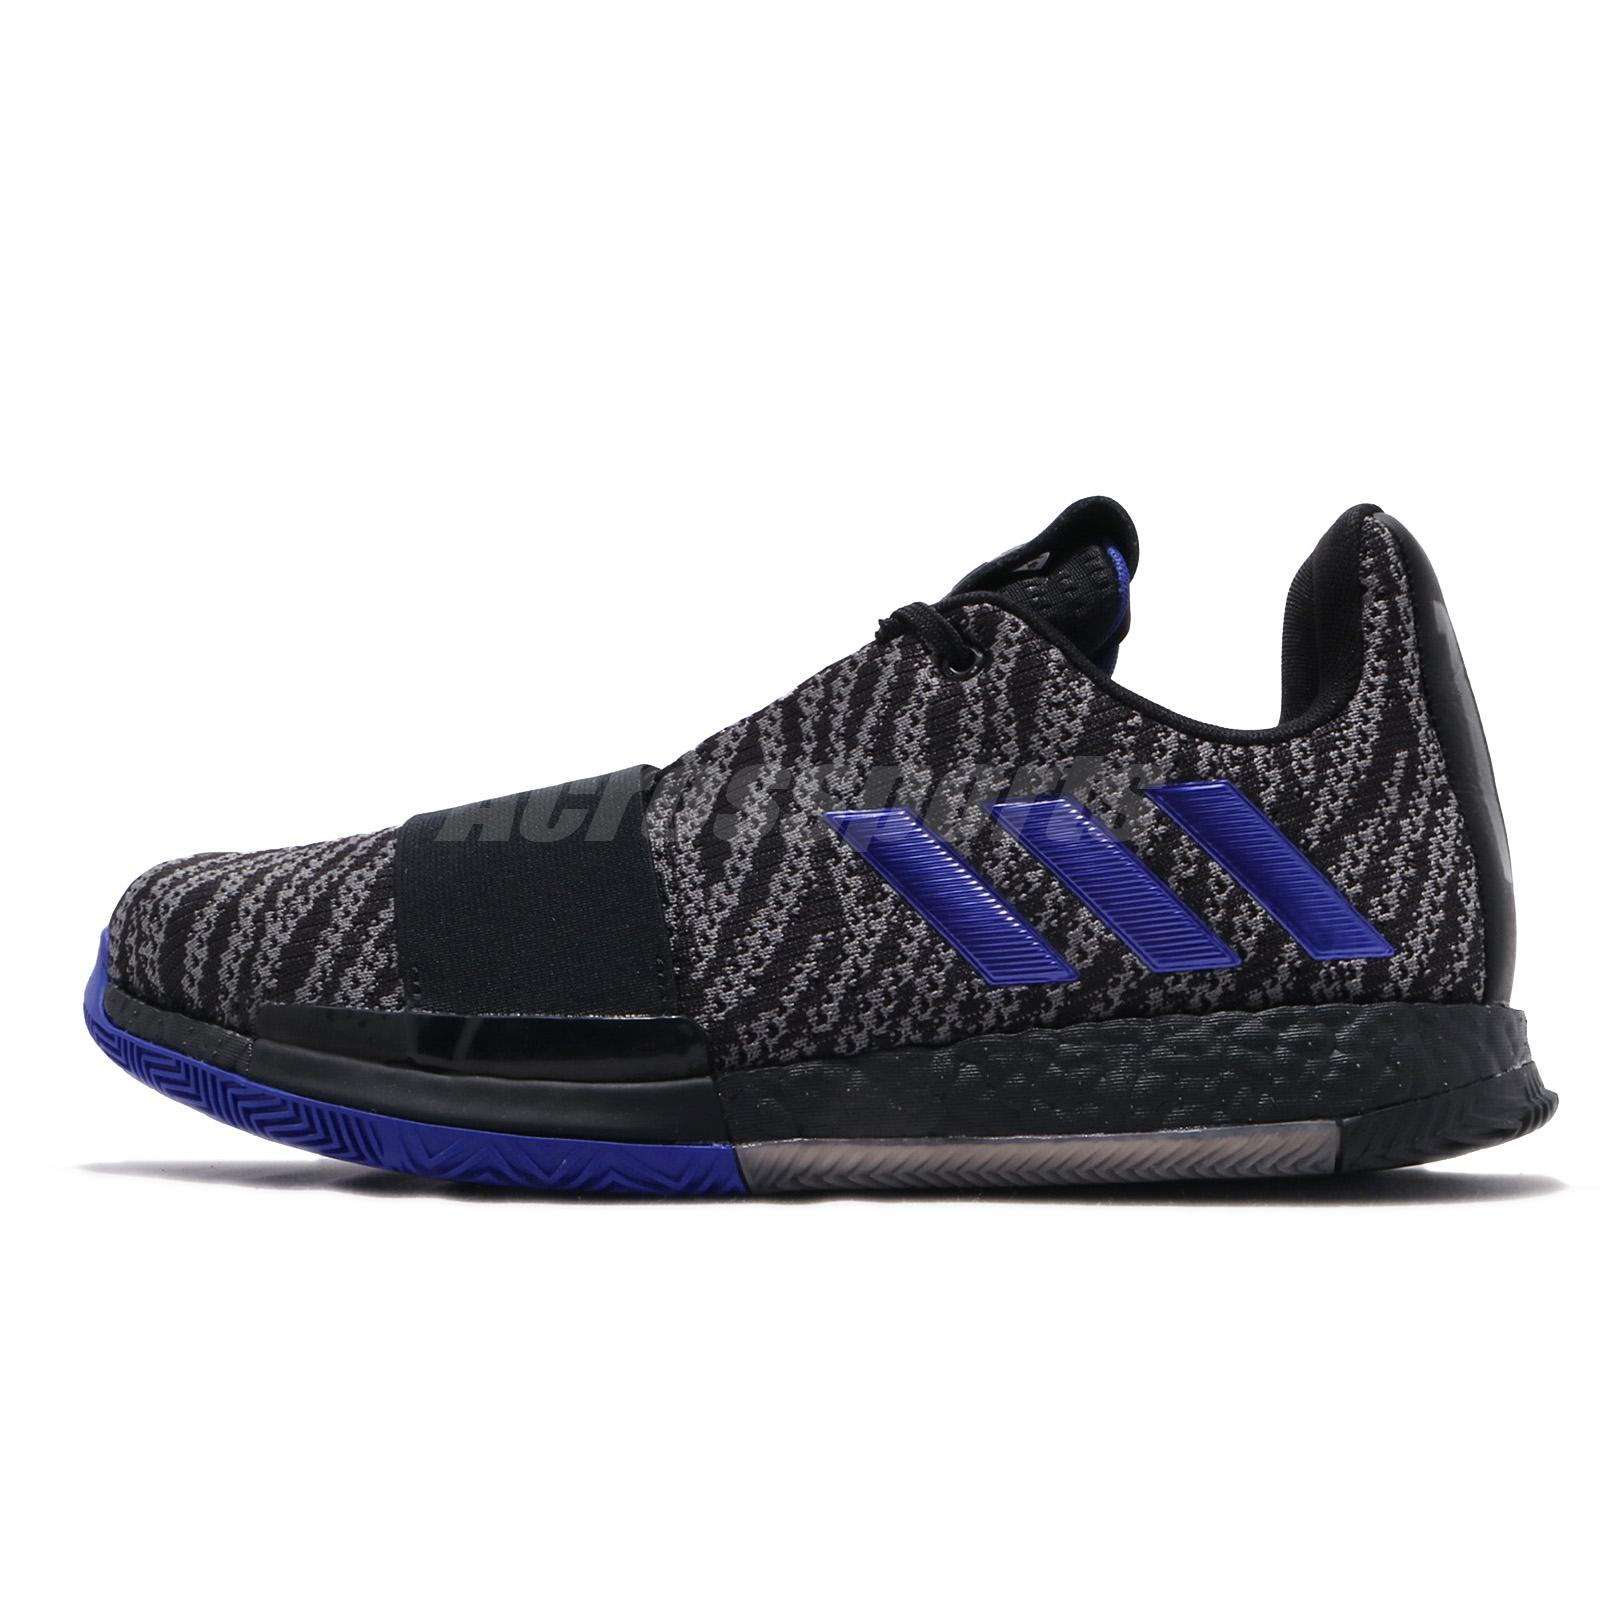 7729fec22313 adidas Harden Vol. 3 III Boost James Black Blue Men Basketball Shoes EE3957